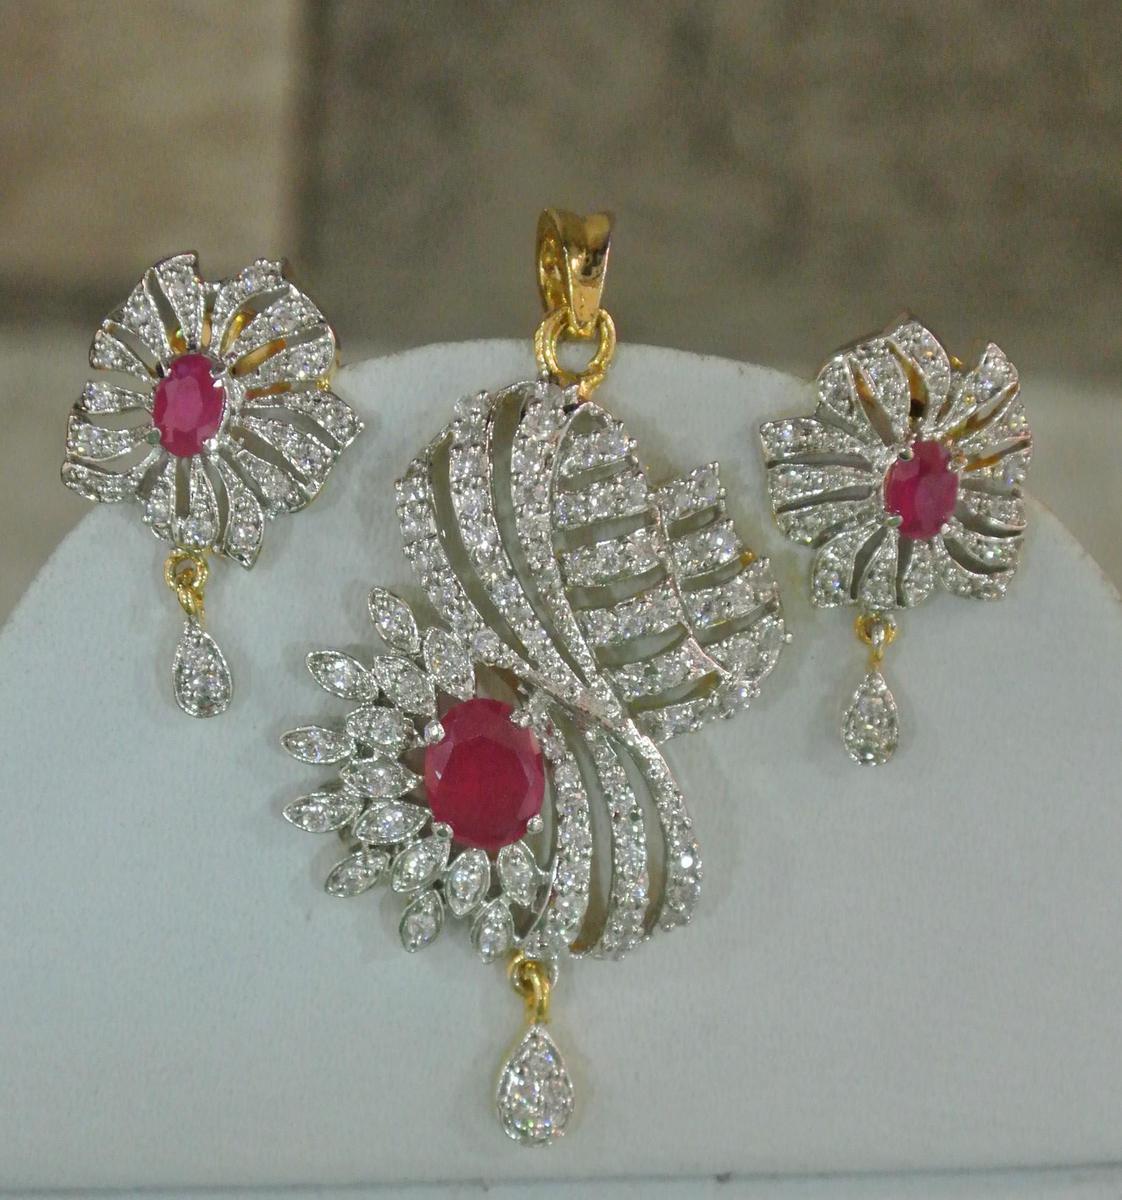 li_58324SmL_indiebazaar_jewellerysets_FashionAmericanDiamondRubyStonePendantSet_fashionite13